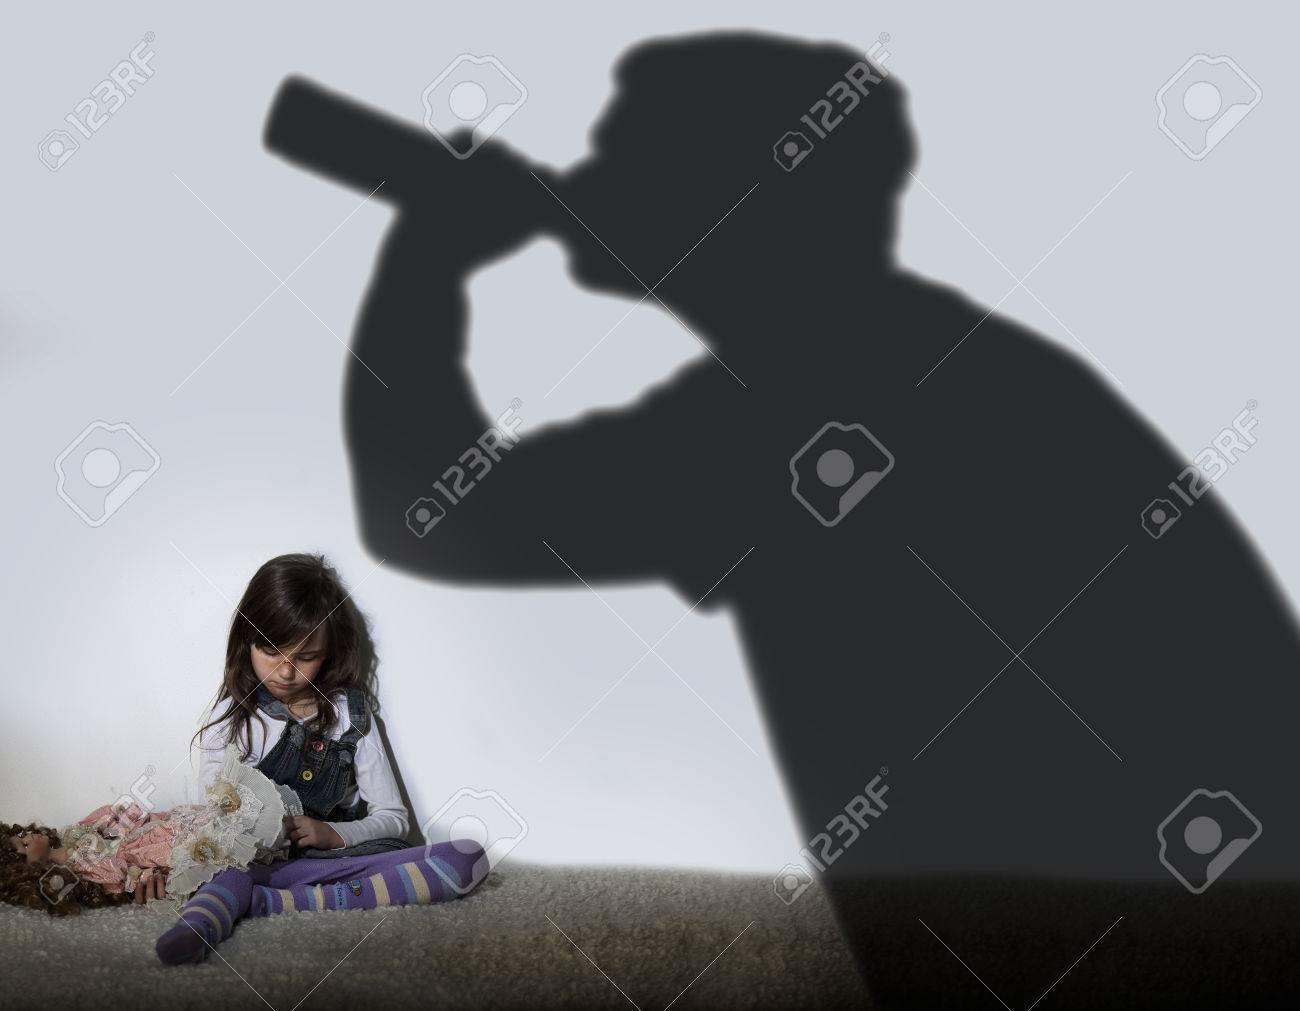 82270342-padre-alcohólico-y-niño-triste